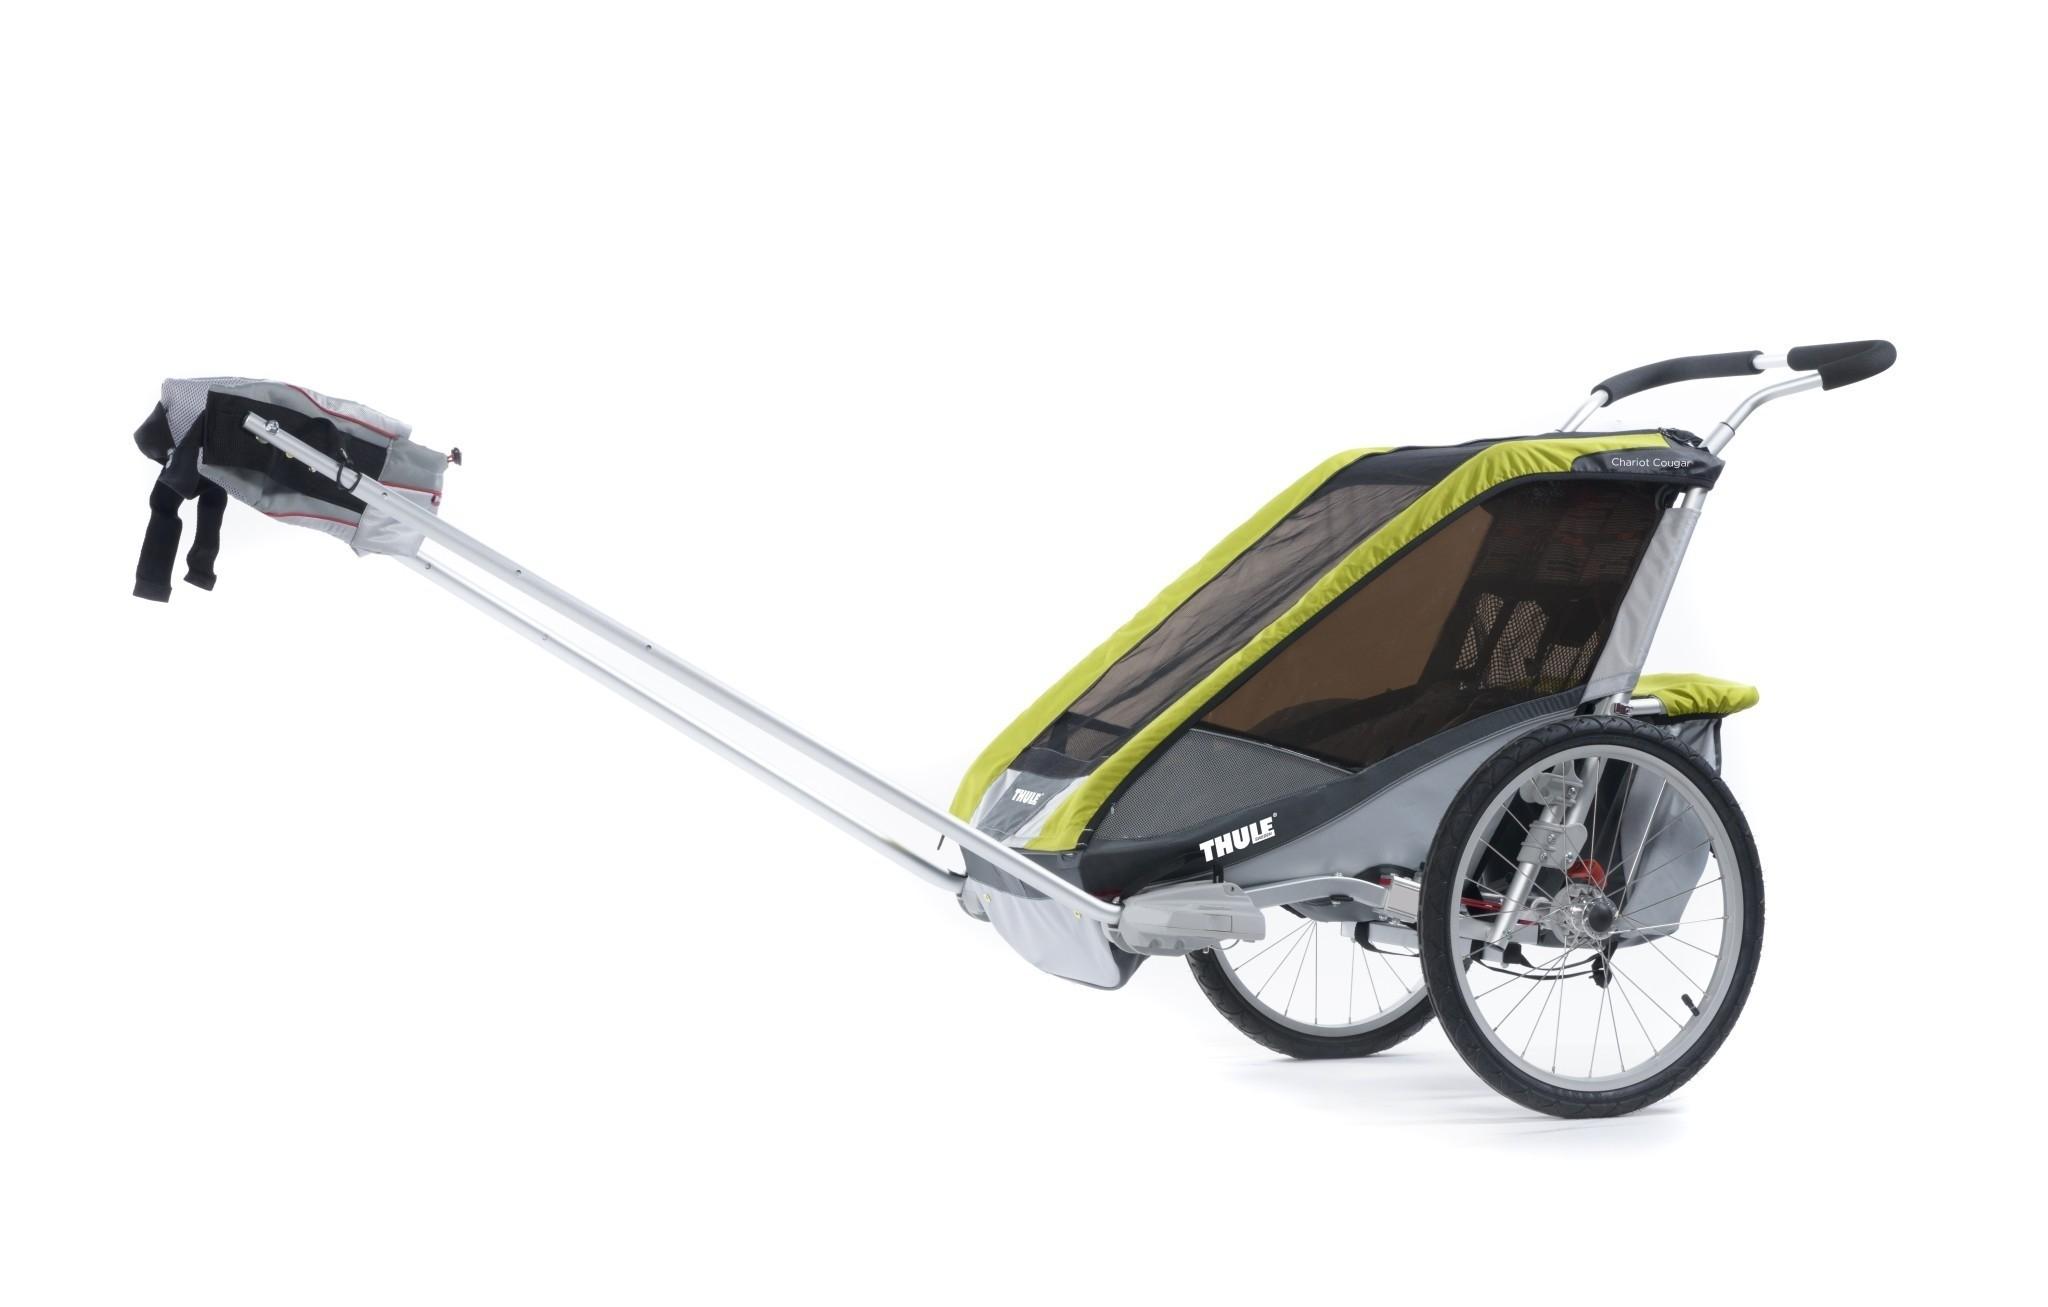 Thule Chariot Cougar 1 Avocado, | Scandinavian Baby